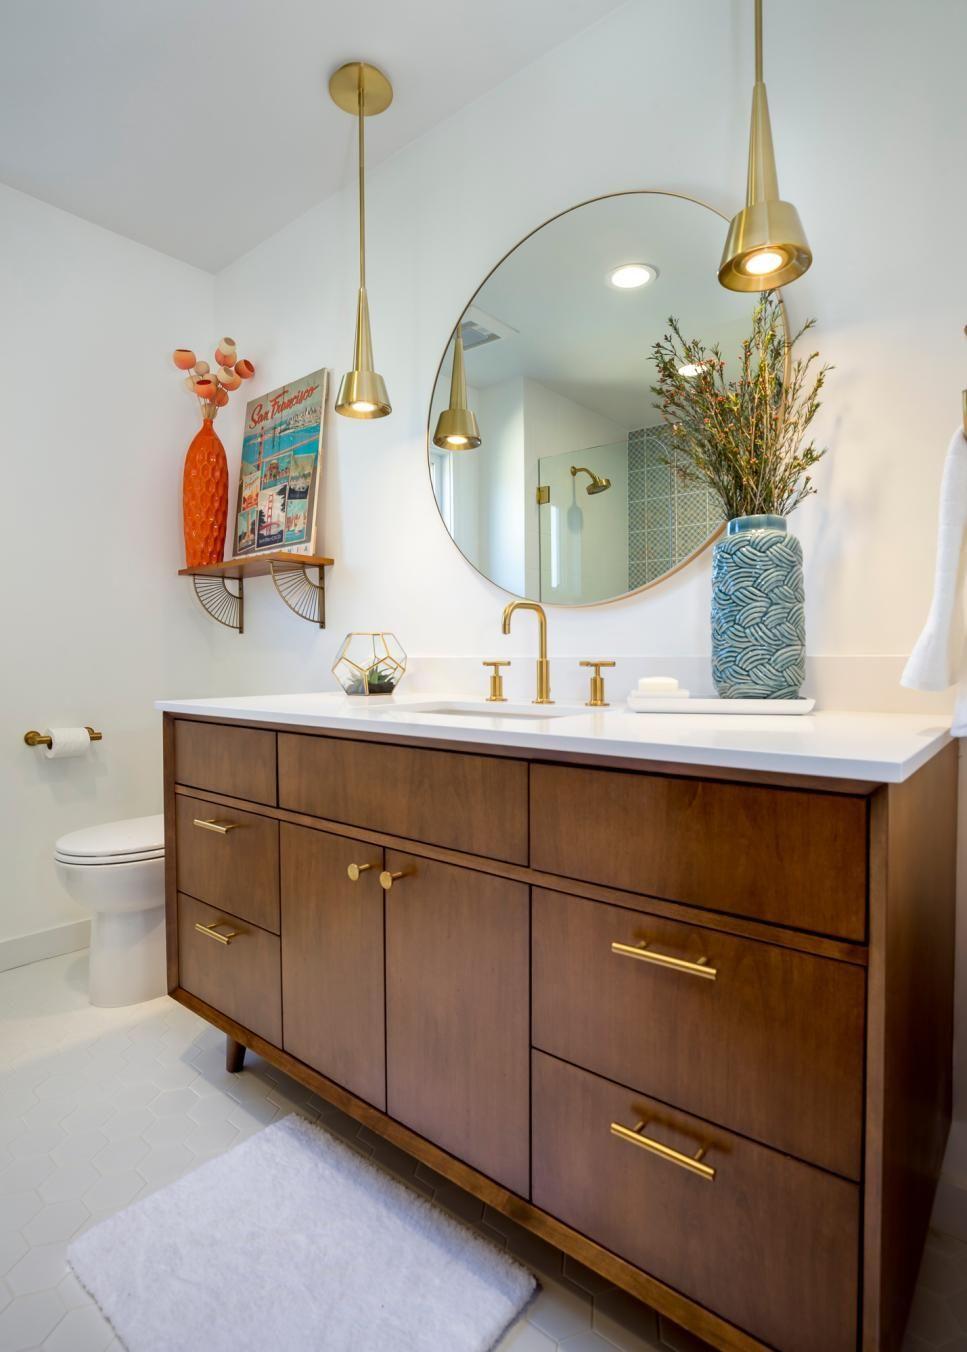 Gold Midcentury Modern Pendant Lights Add Glam To Bathroom Remodel